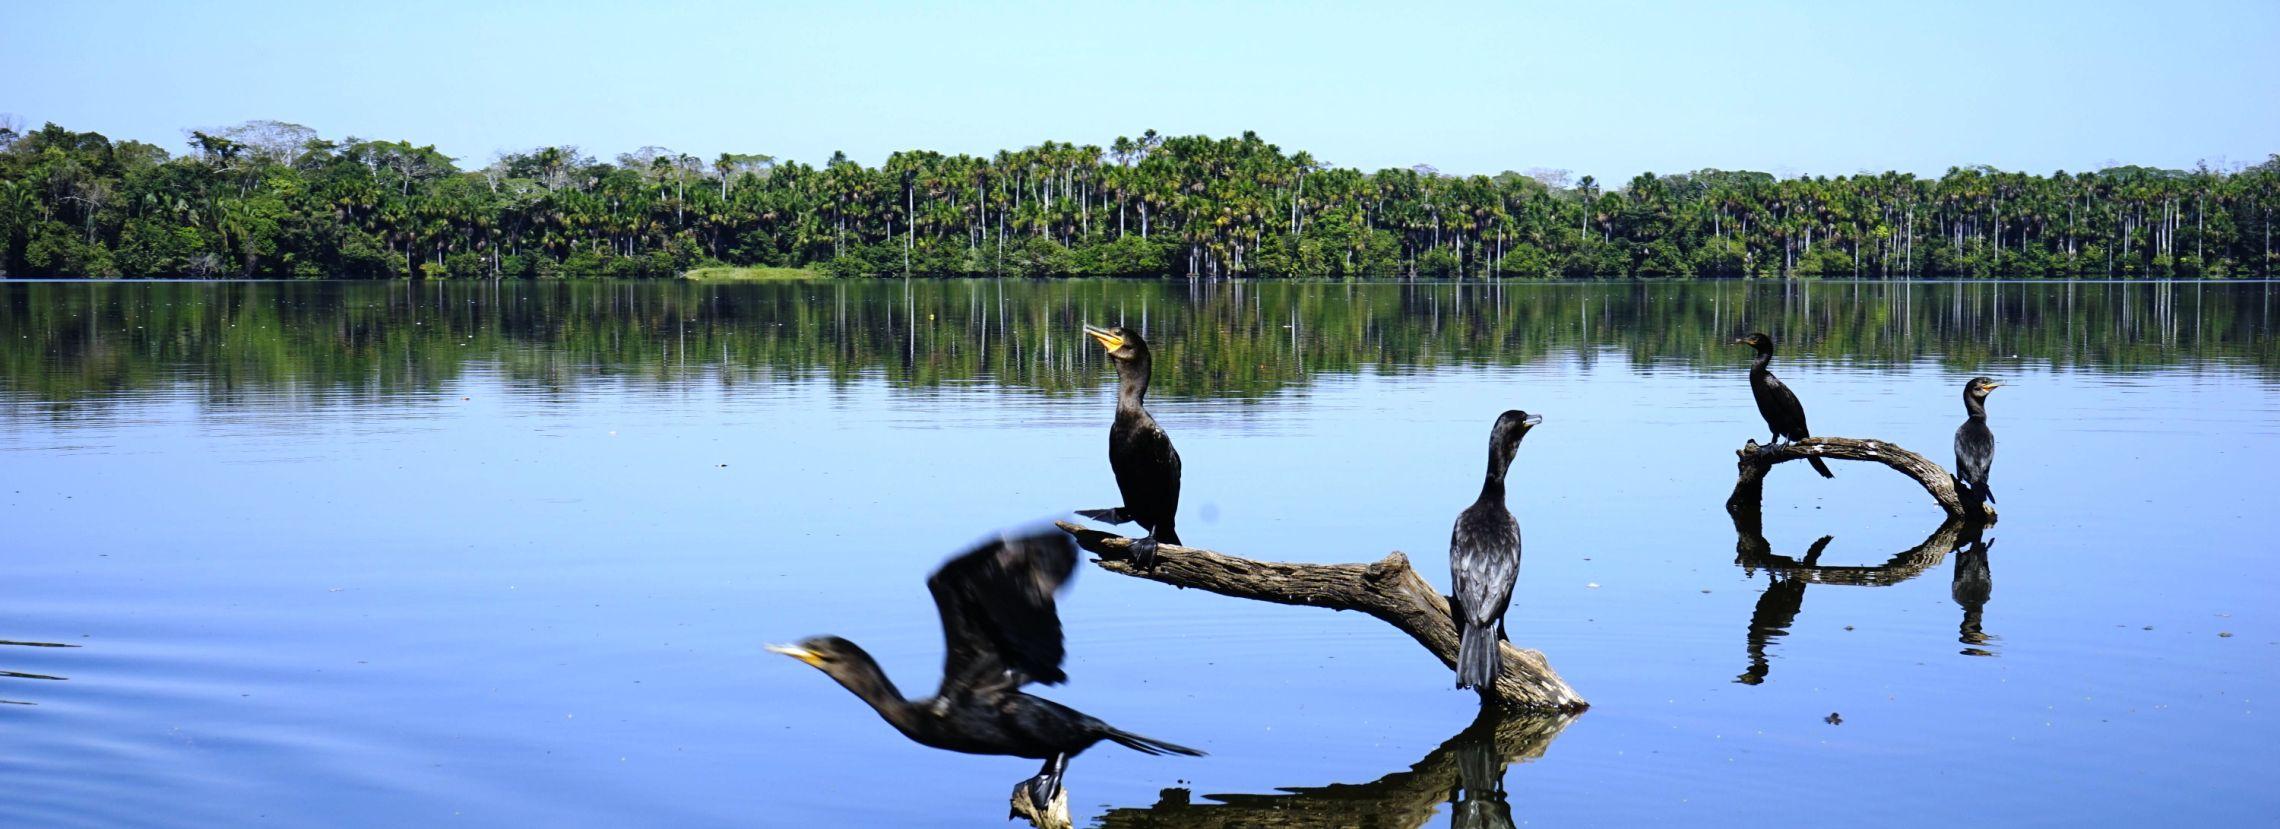 viaggi in 4x4 in peru turismo responsabile peruresponsabile 23.jpg